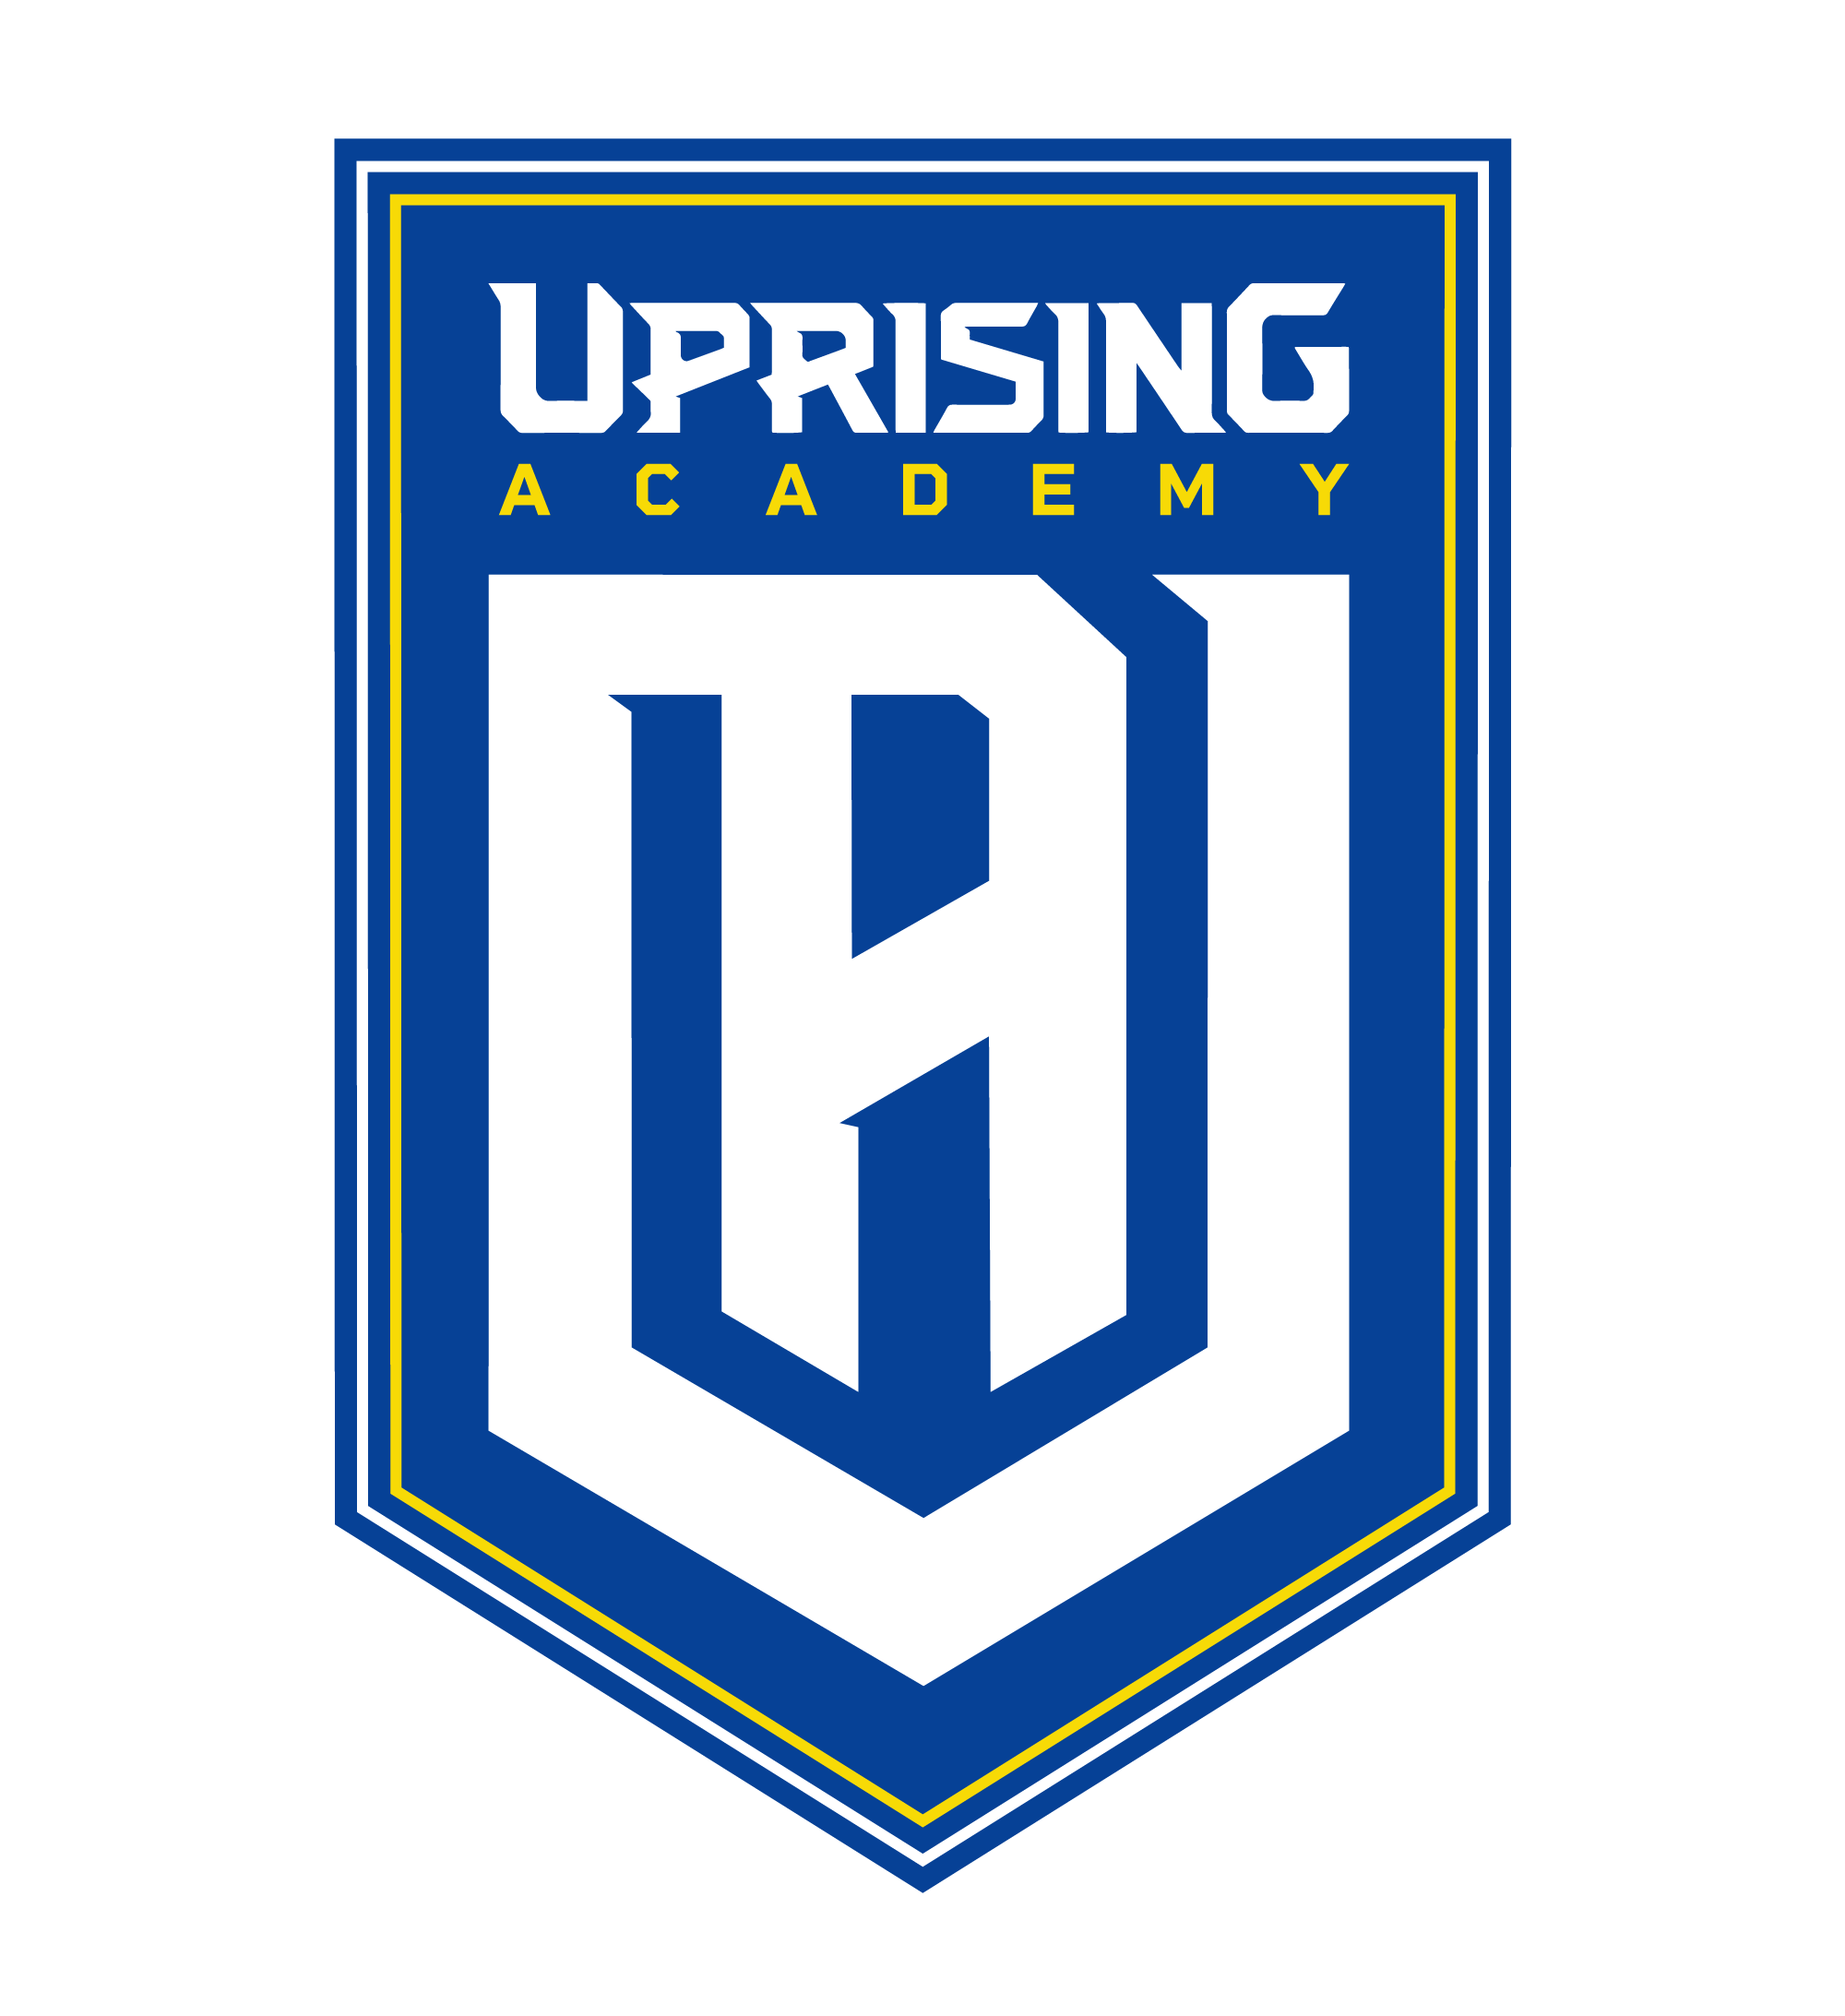 Uprising Academy